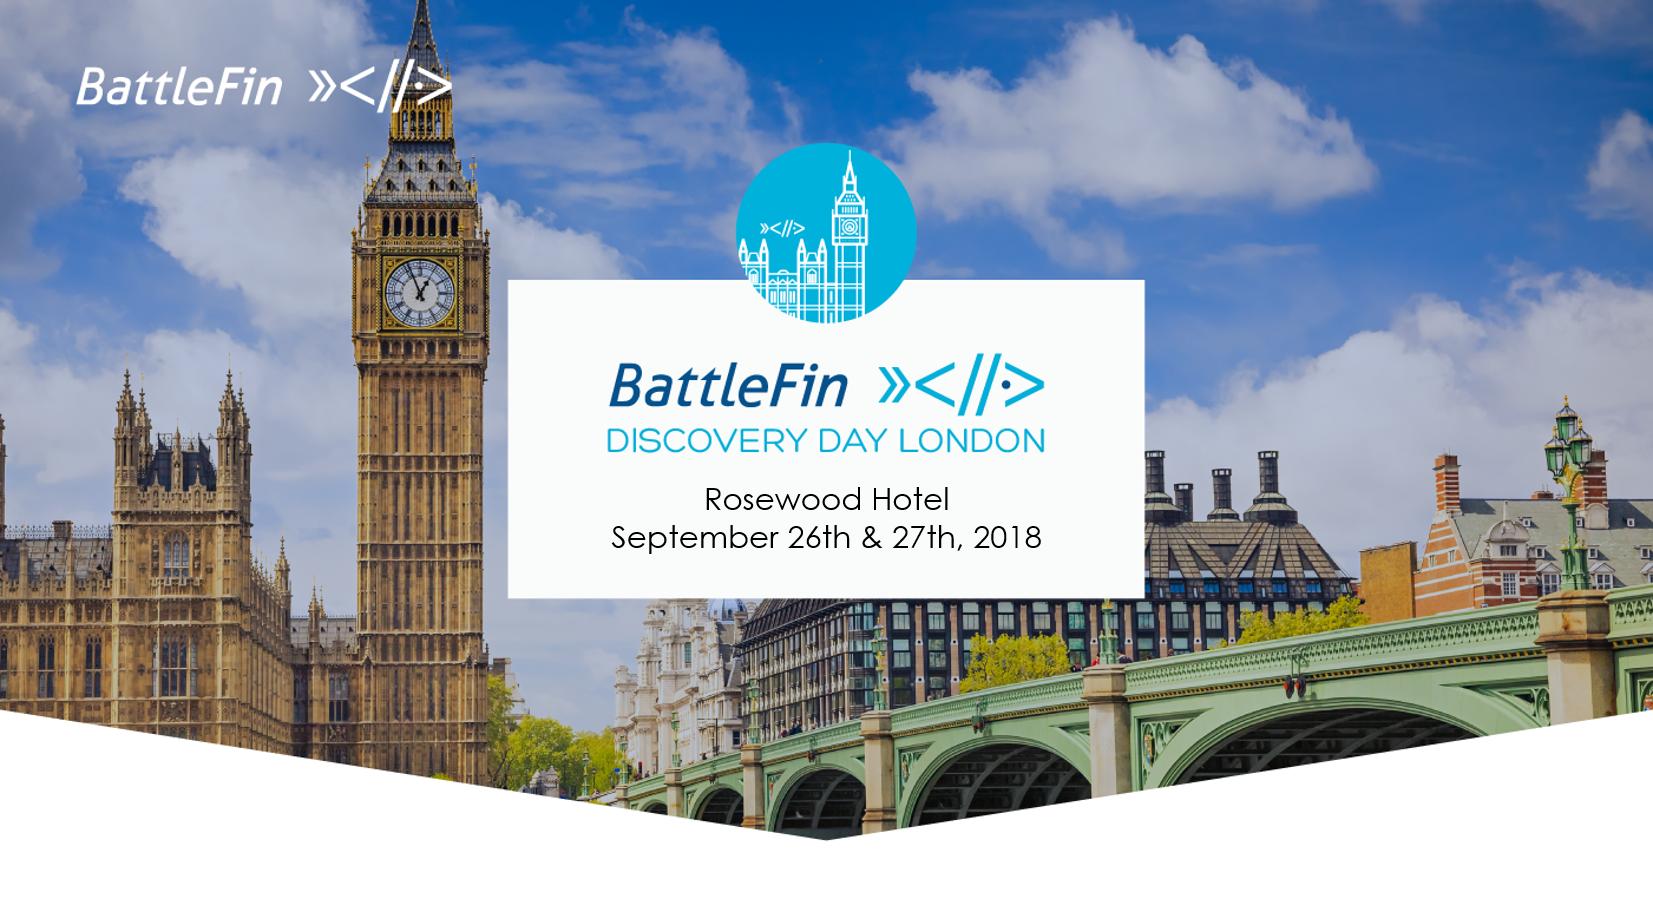 BattleFin London